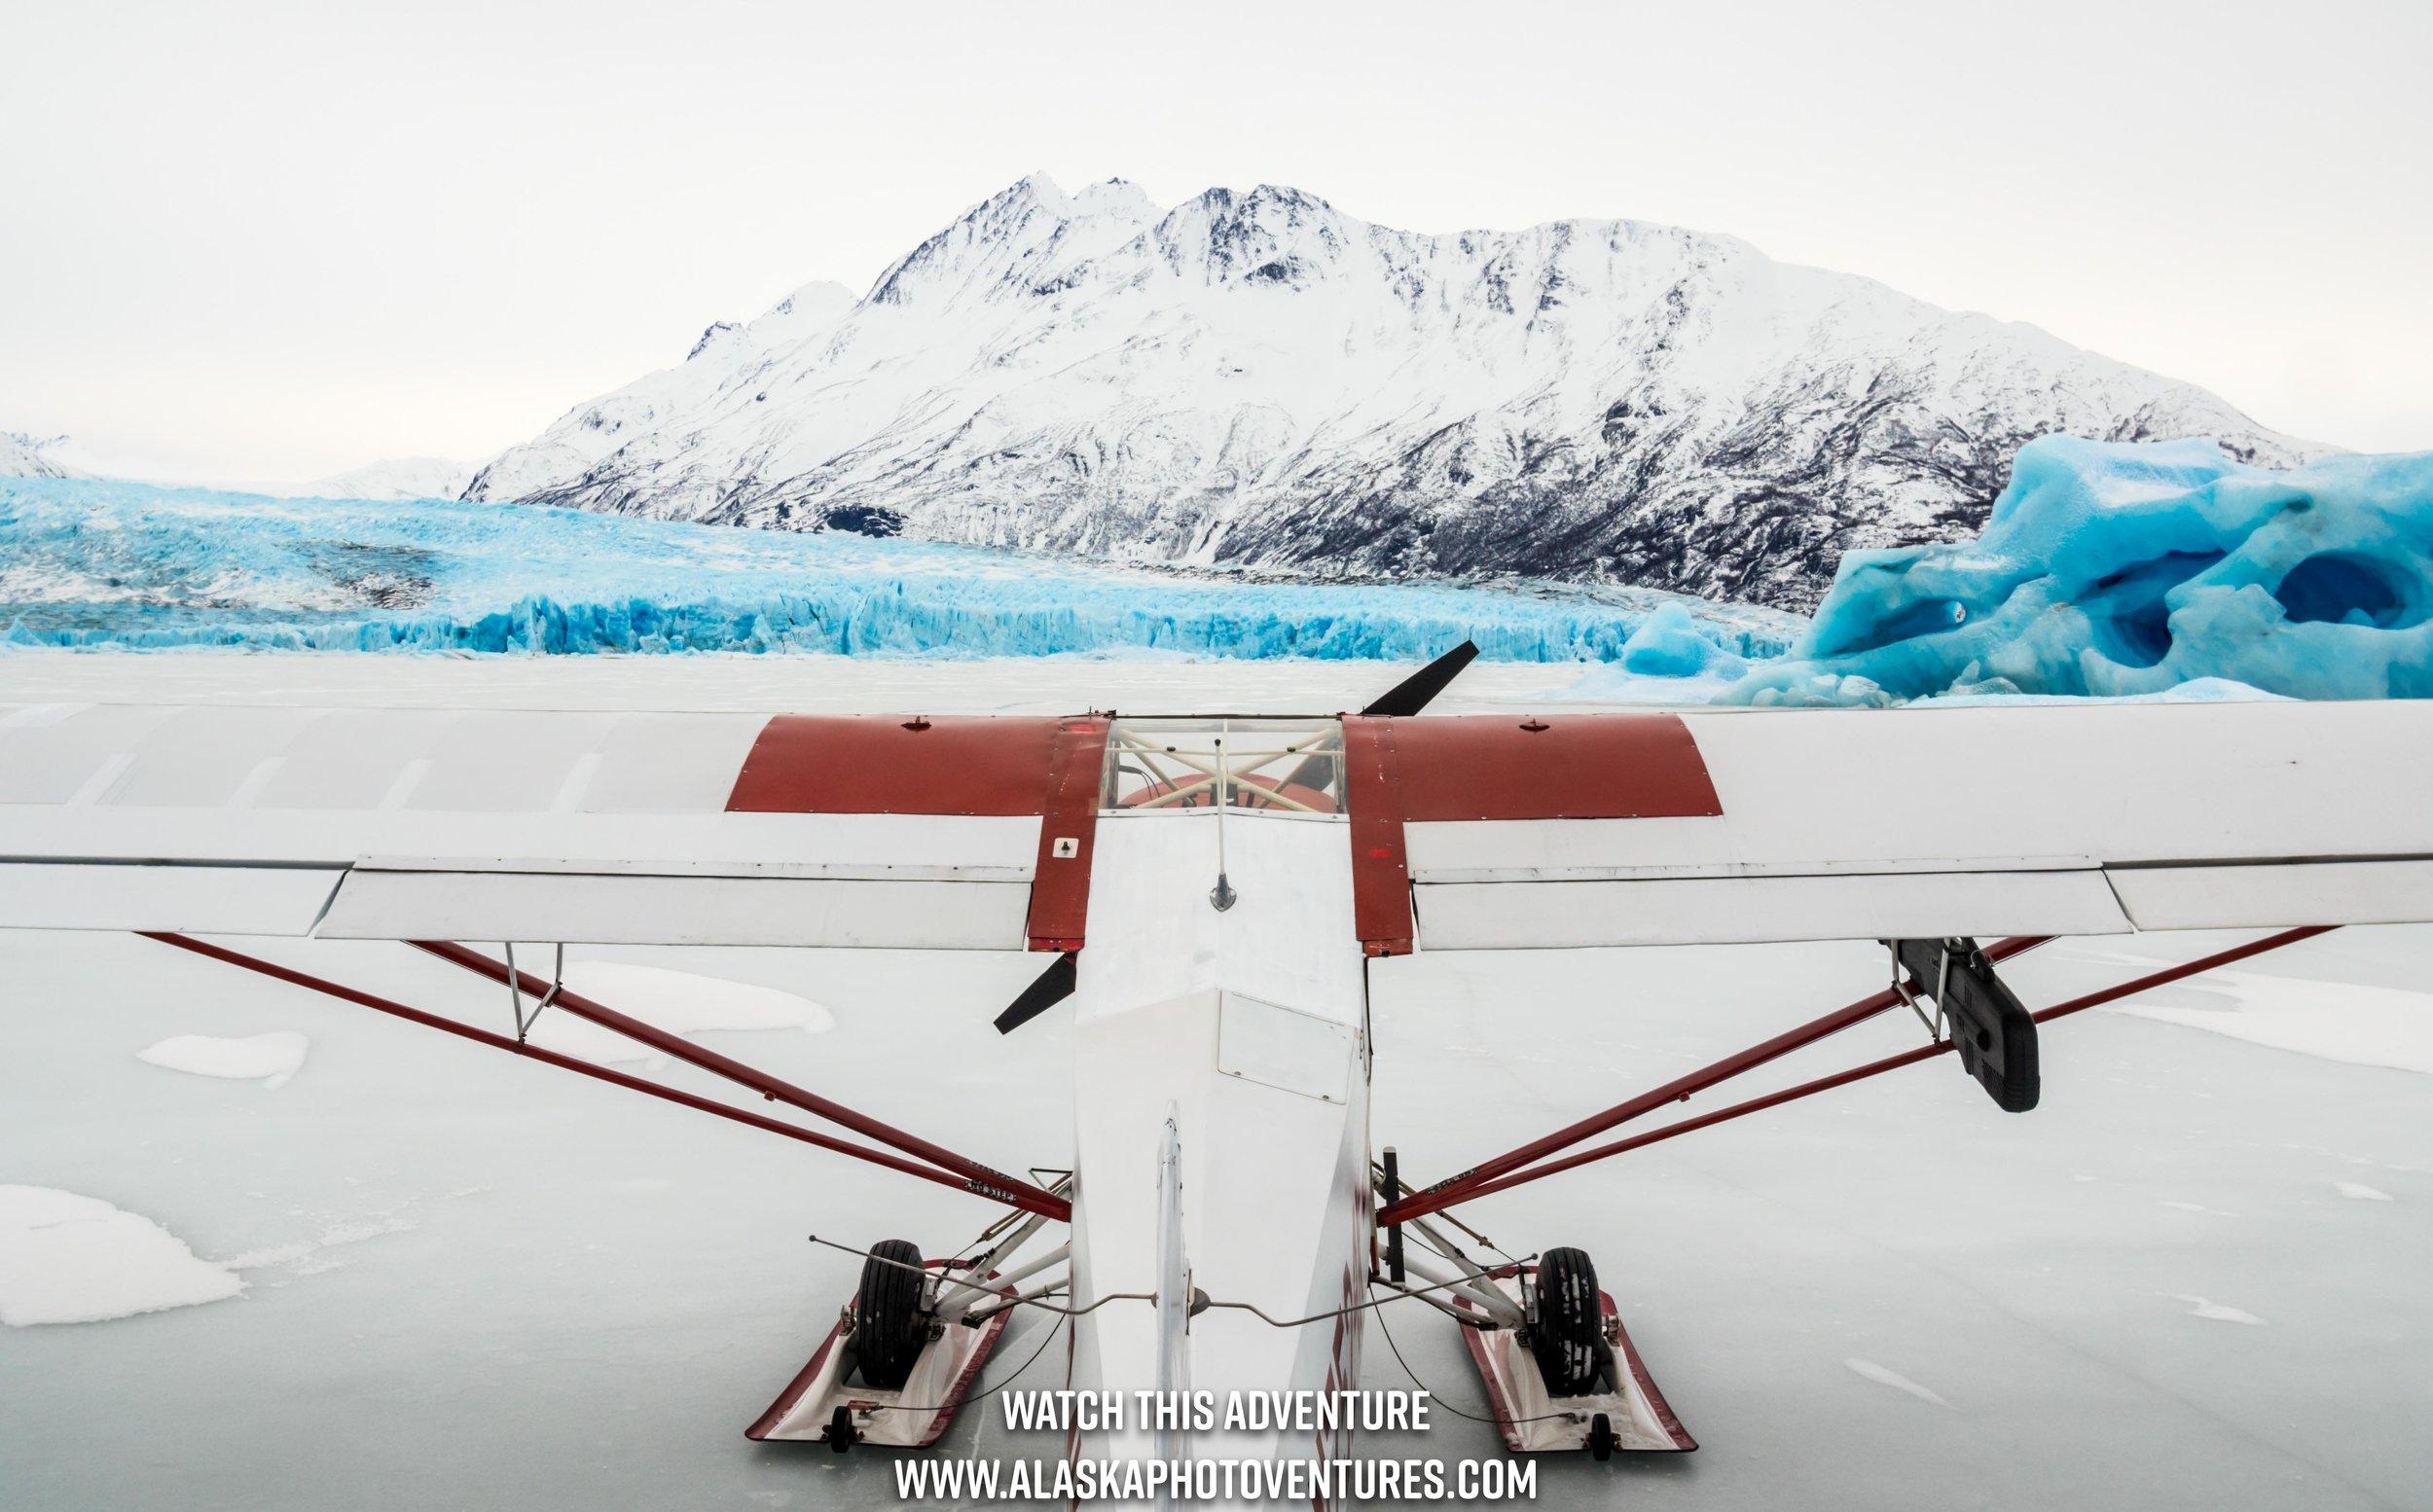 alaska-bush-planes-frozen-lake-colony-glacier-adventure-photography1.jpg